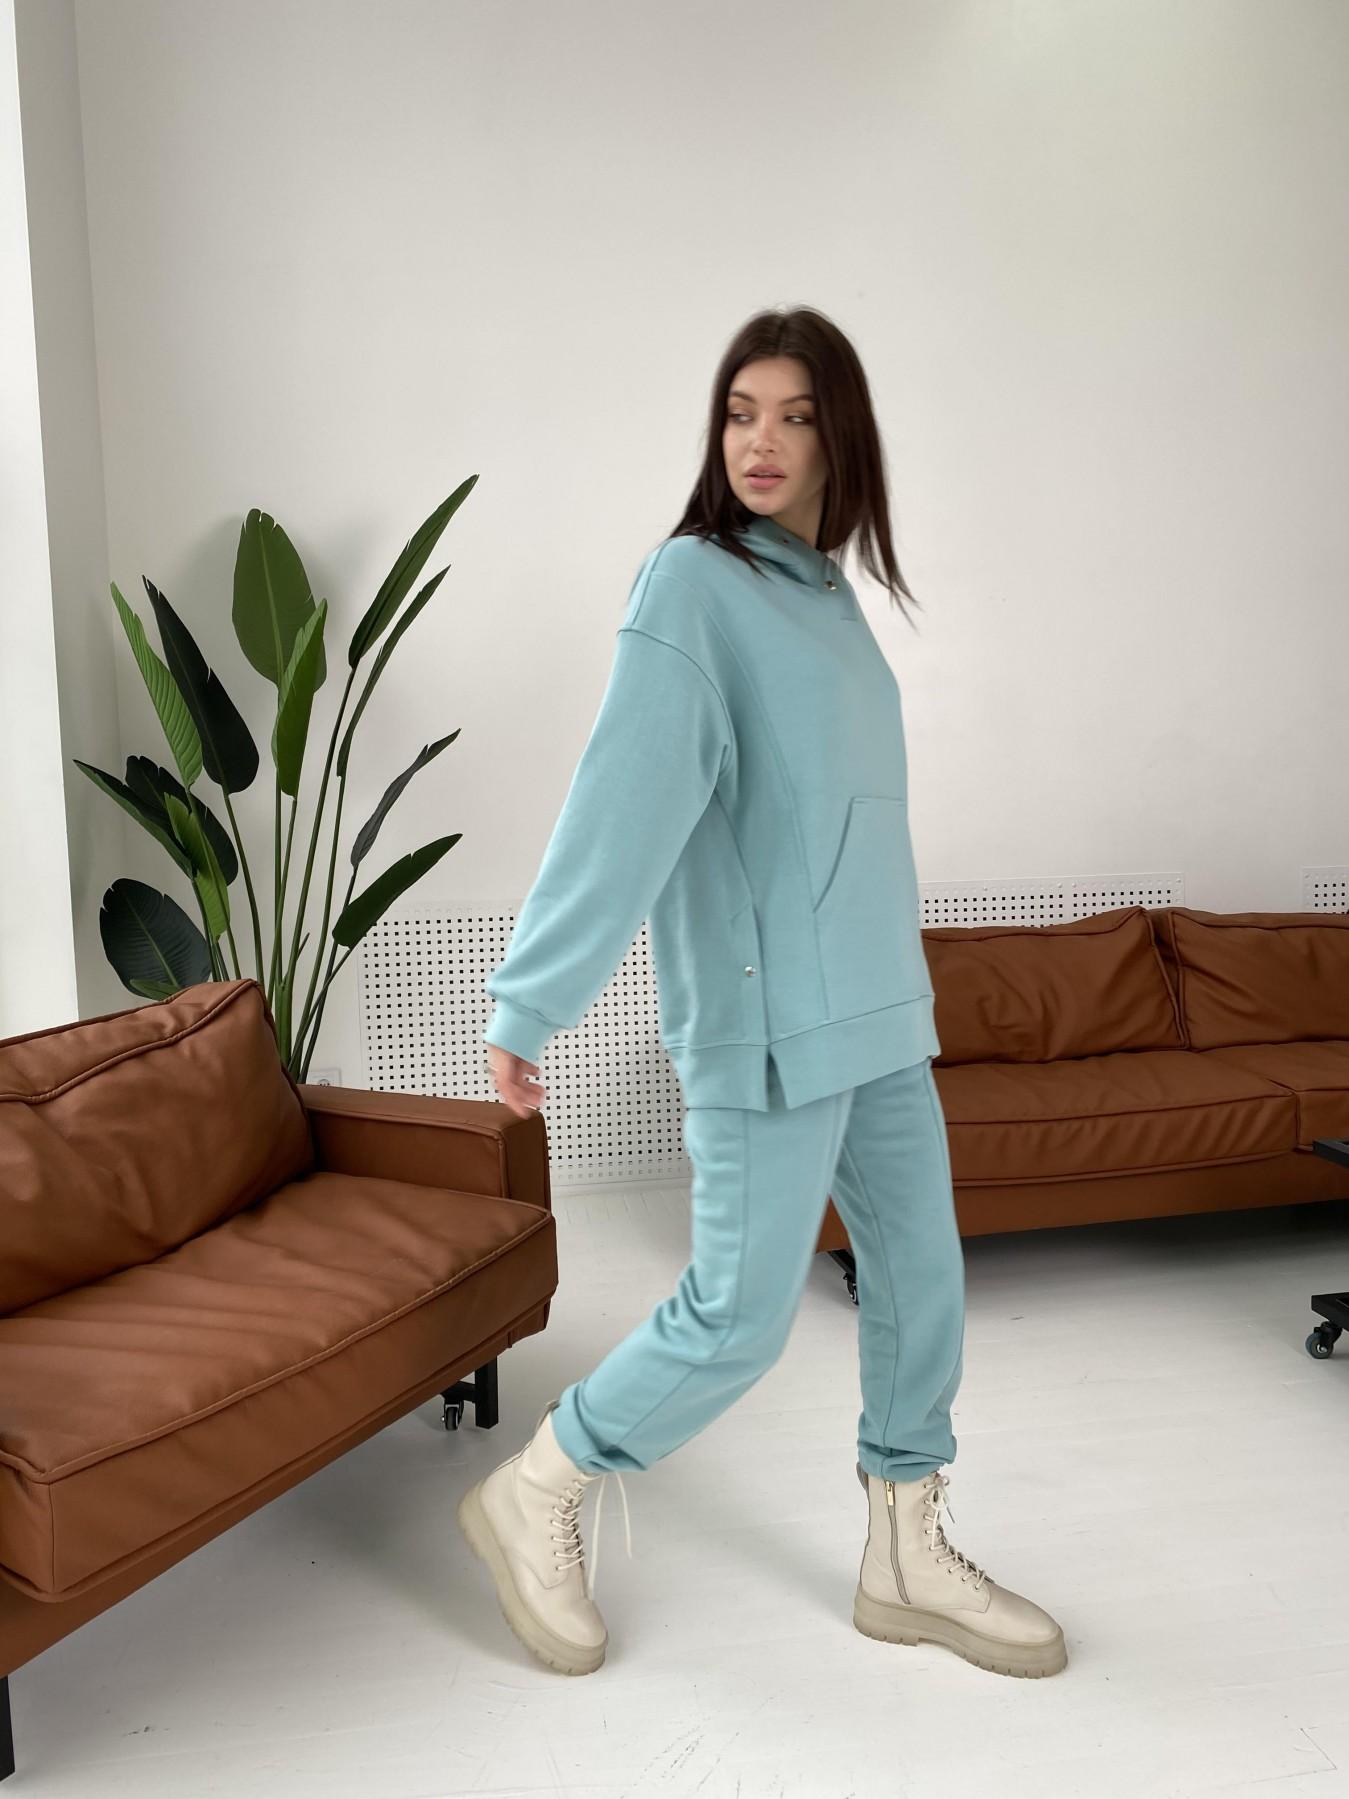 Лайф костюм  из 3х нитки 10782 АРТ. 47205 Цвет: Олива - фото 3, интернет магазин tm-modus.ru